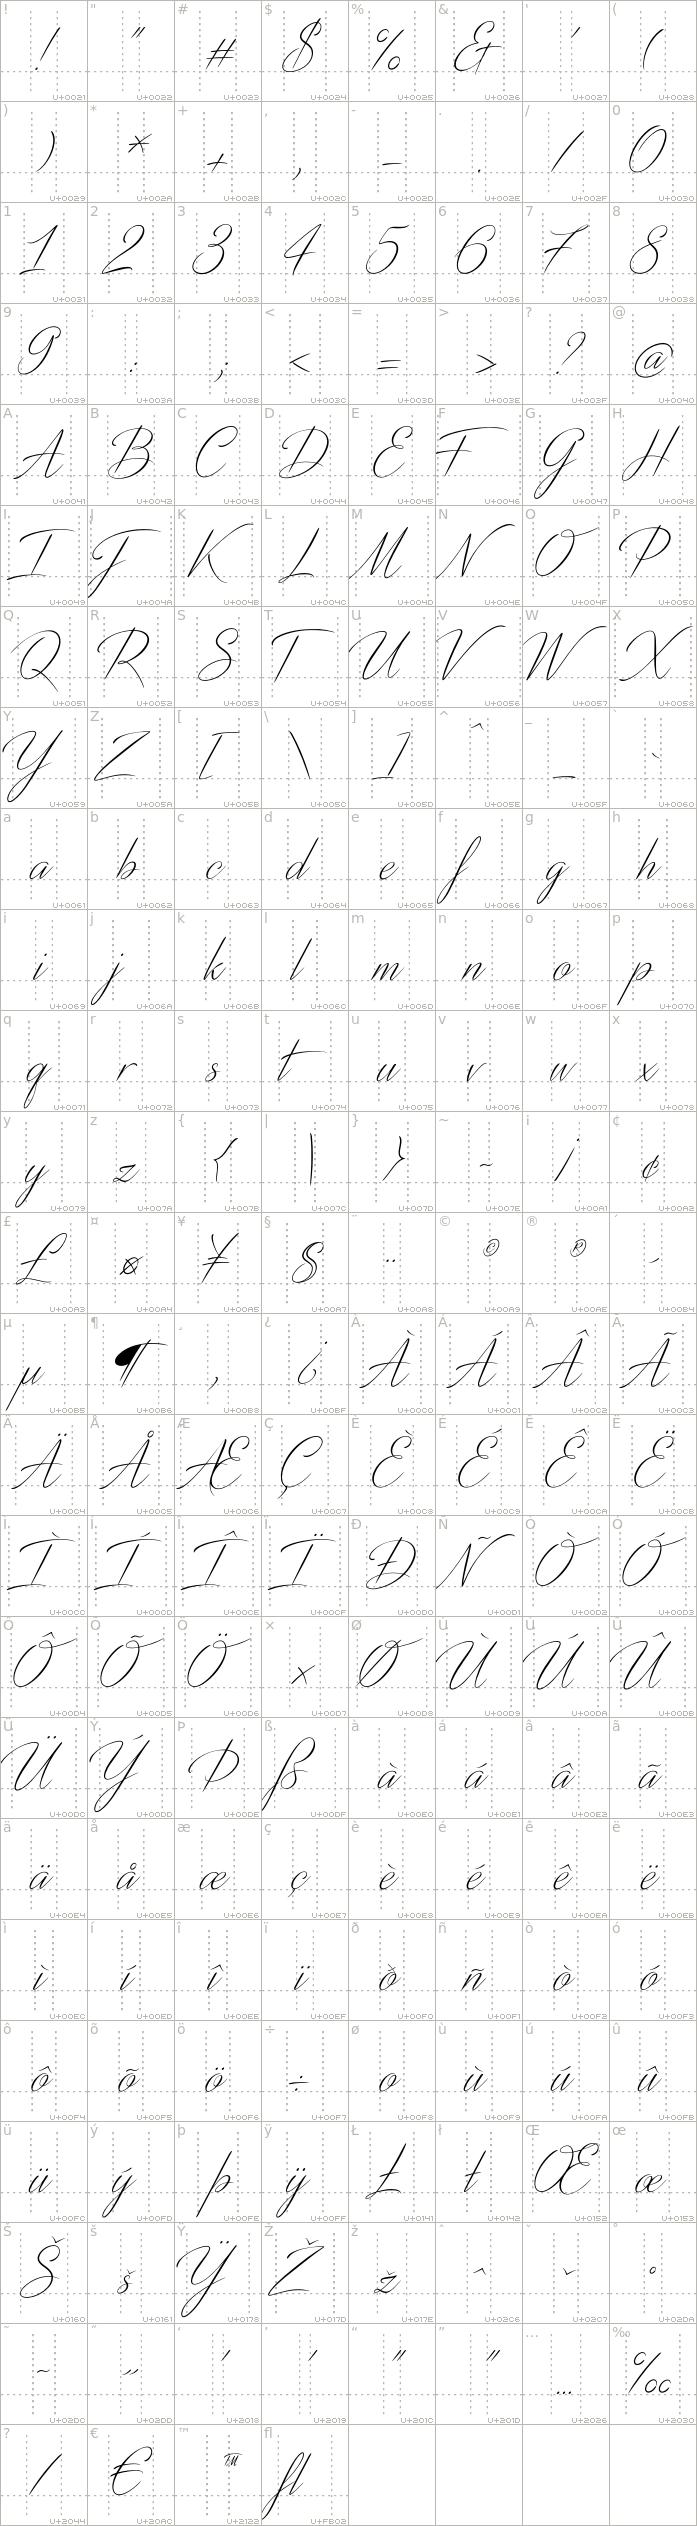 distant-stroke.regular.character-map-1